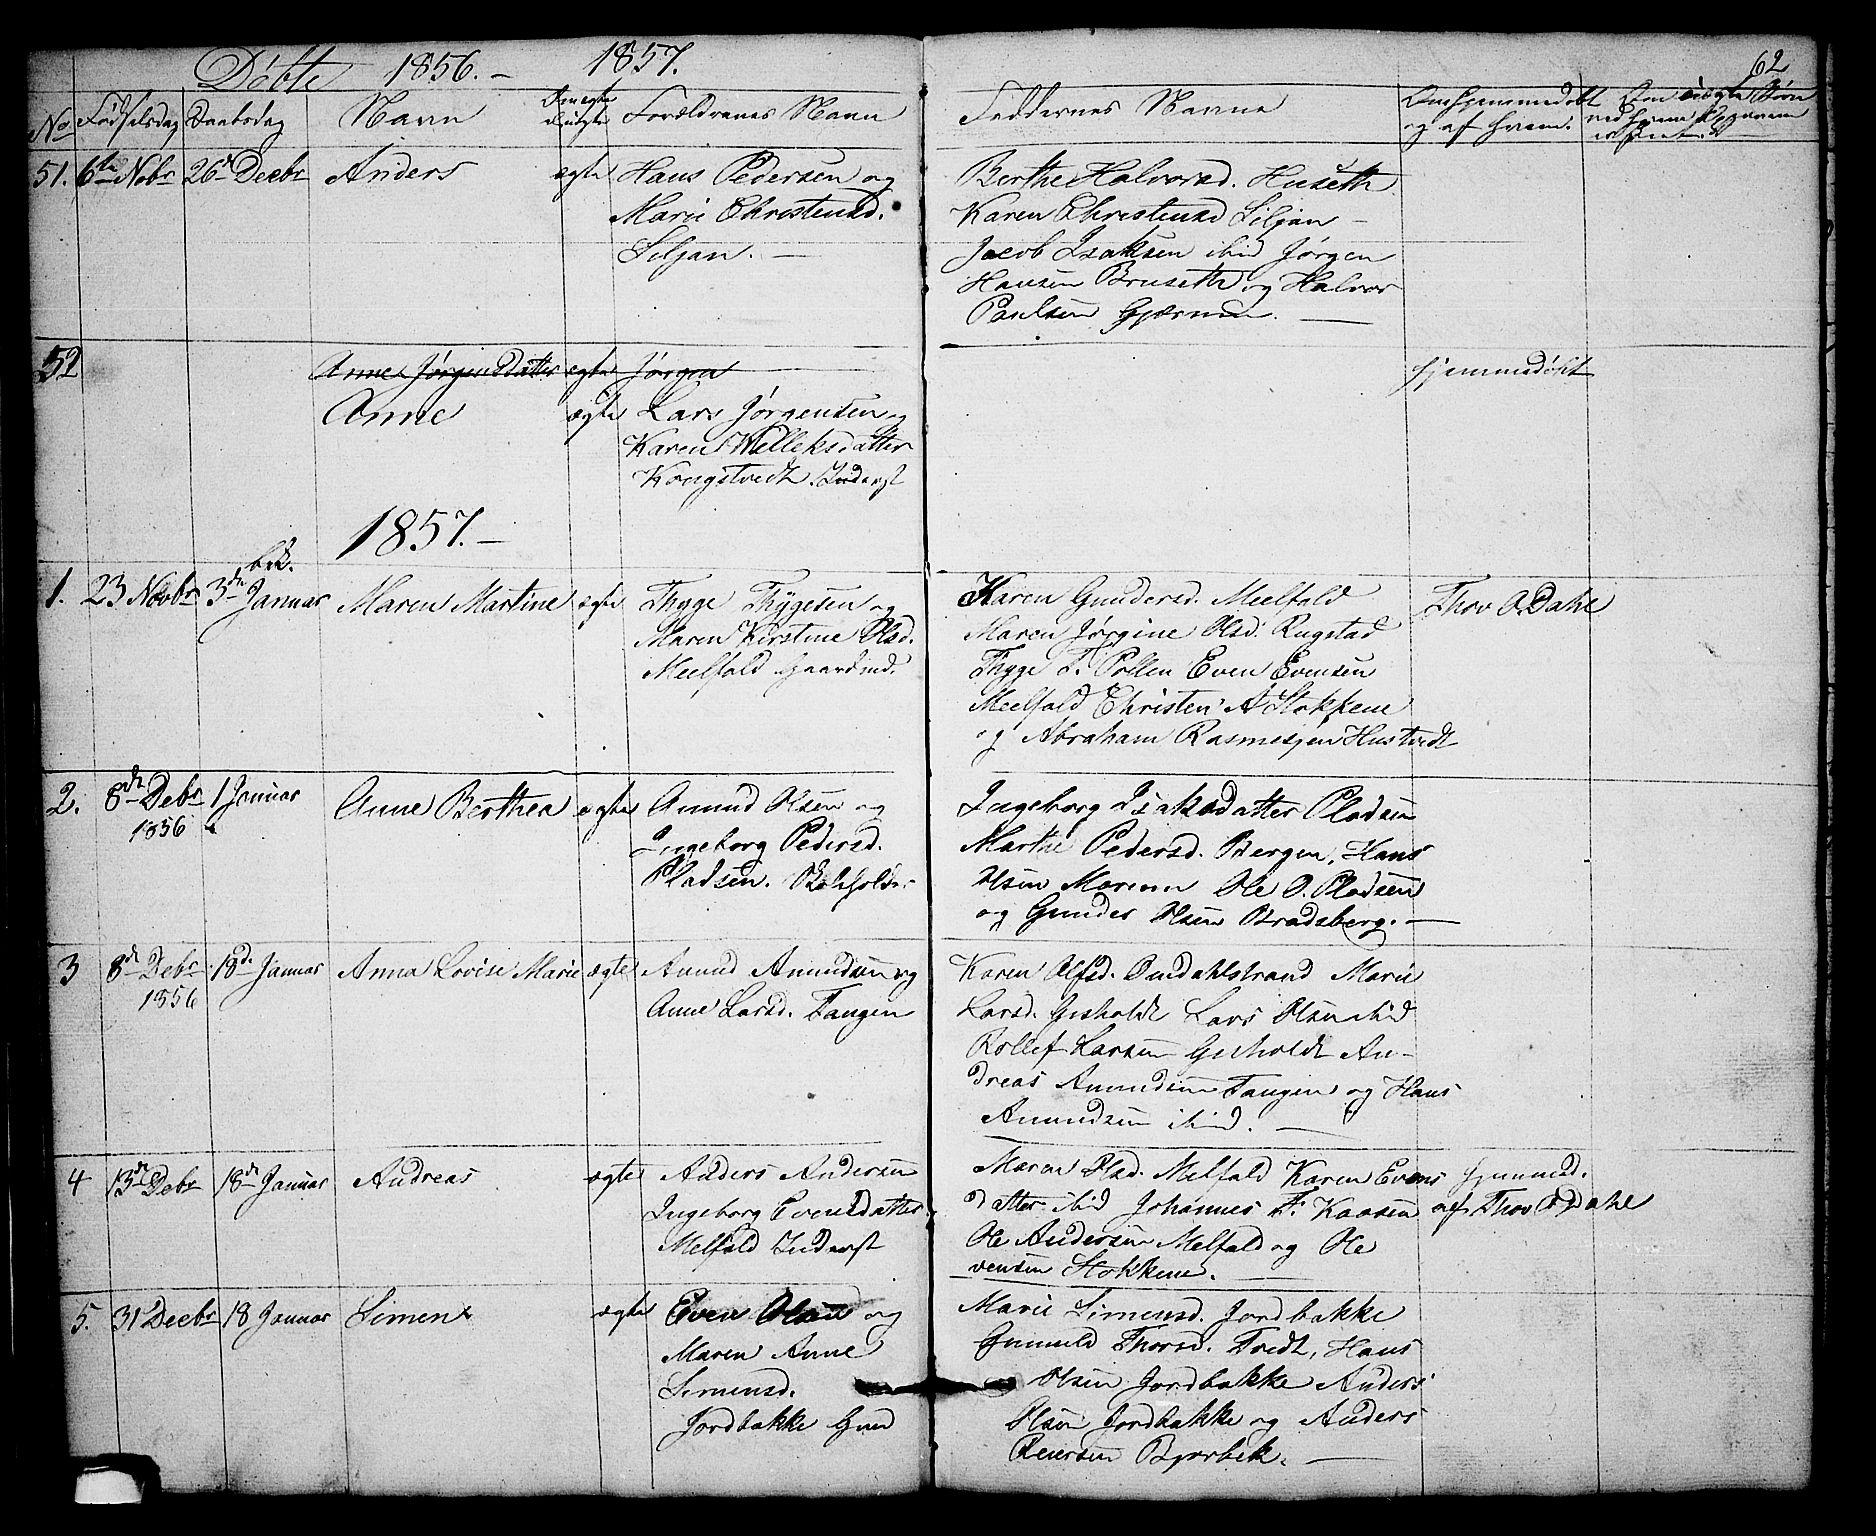 SAKO, Solum kirkebøker, G/Gb/L0001: Klokkerbok nr. II 1, 1848-1859, s. 62